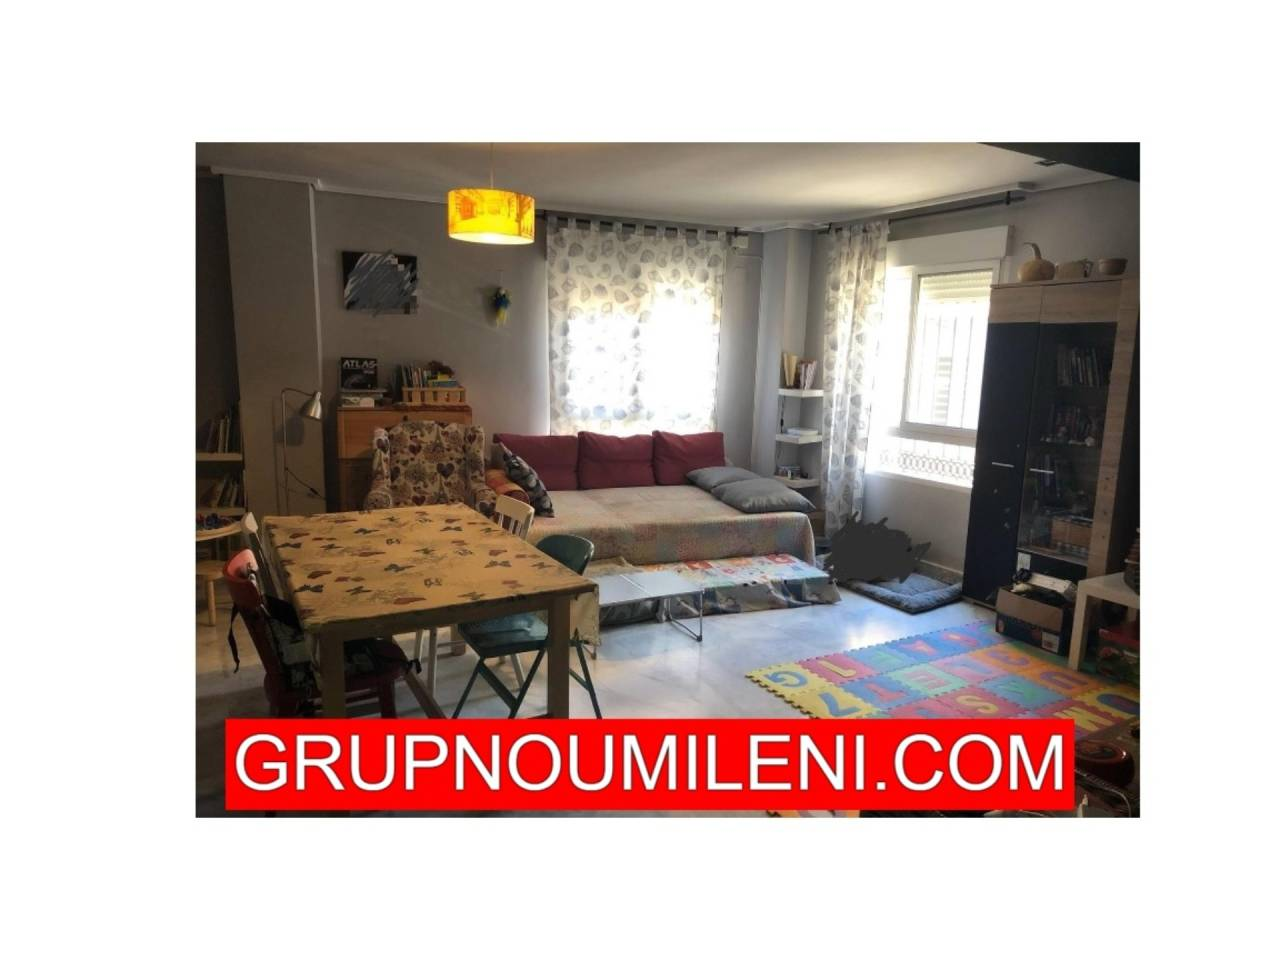 Lloguer Casa  Catarroja. Superficie total 154 m², casa superficie útil 153 m², habitacion